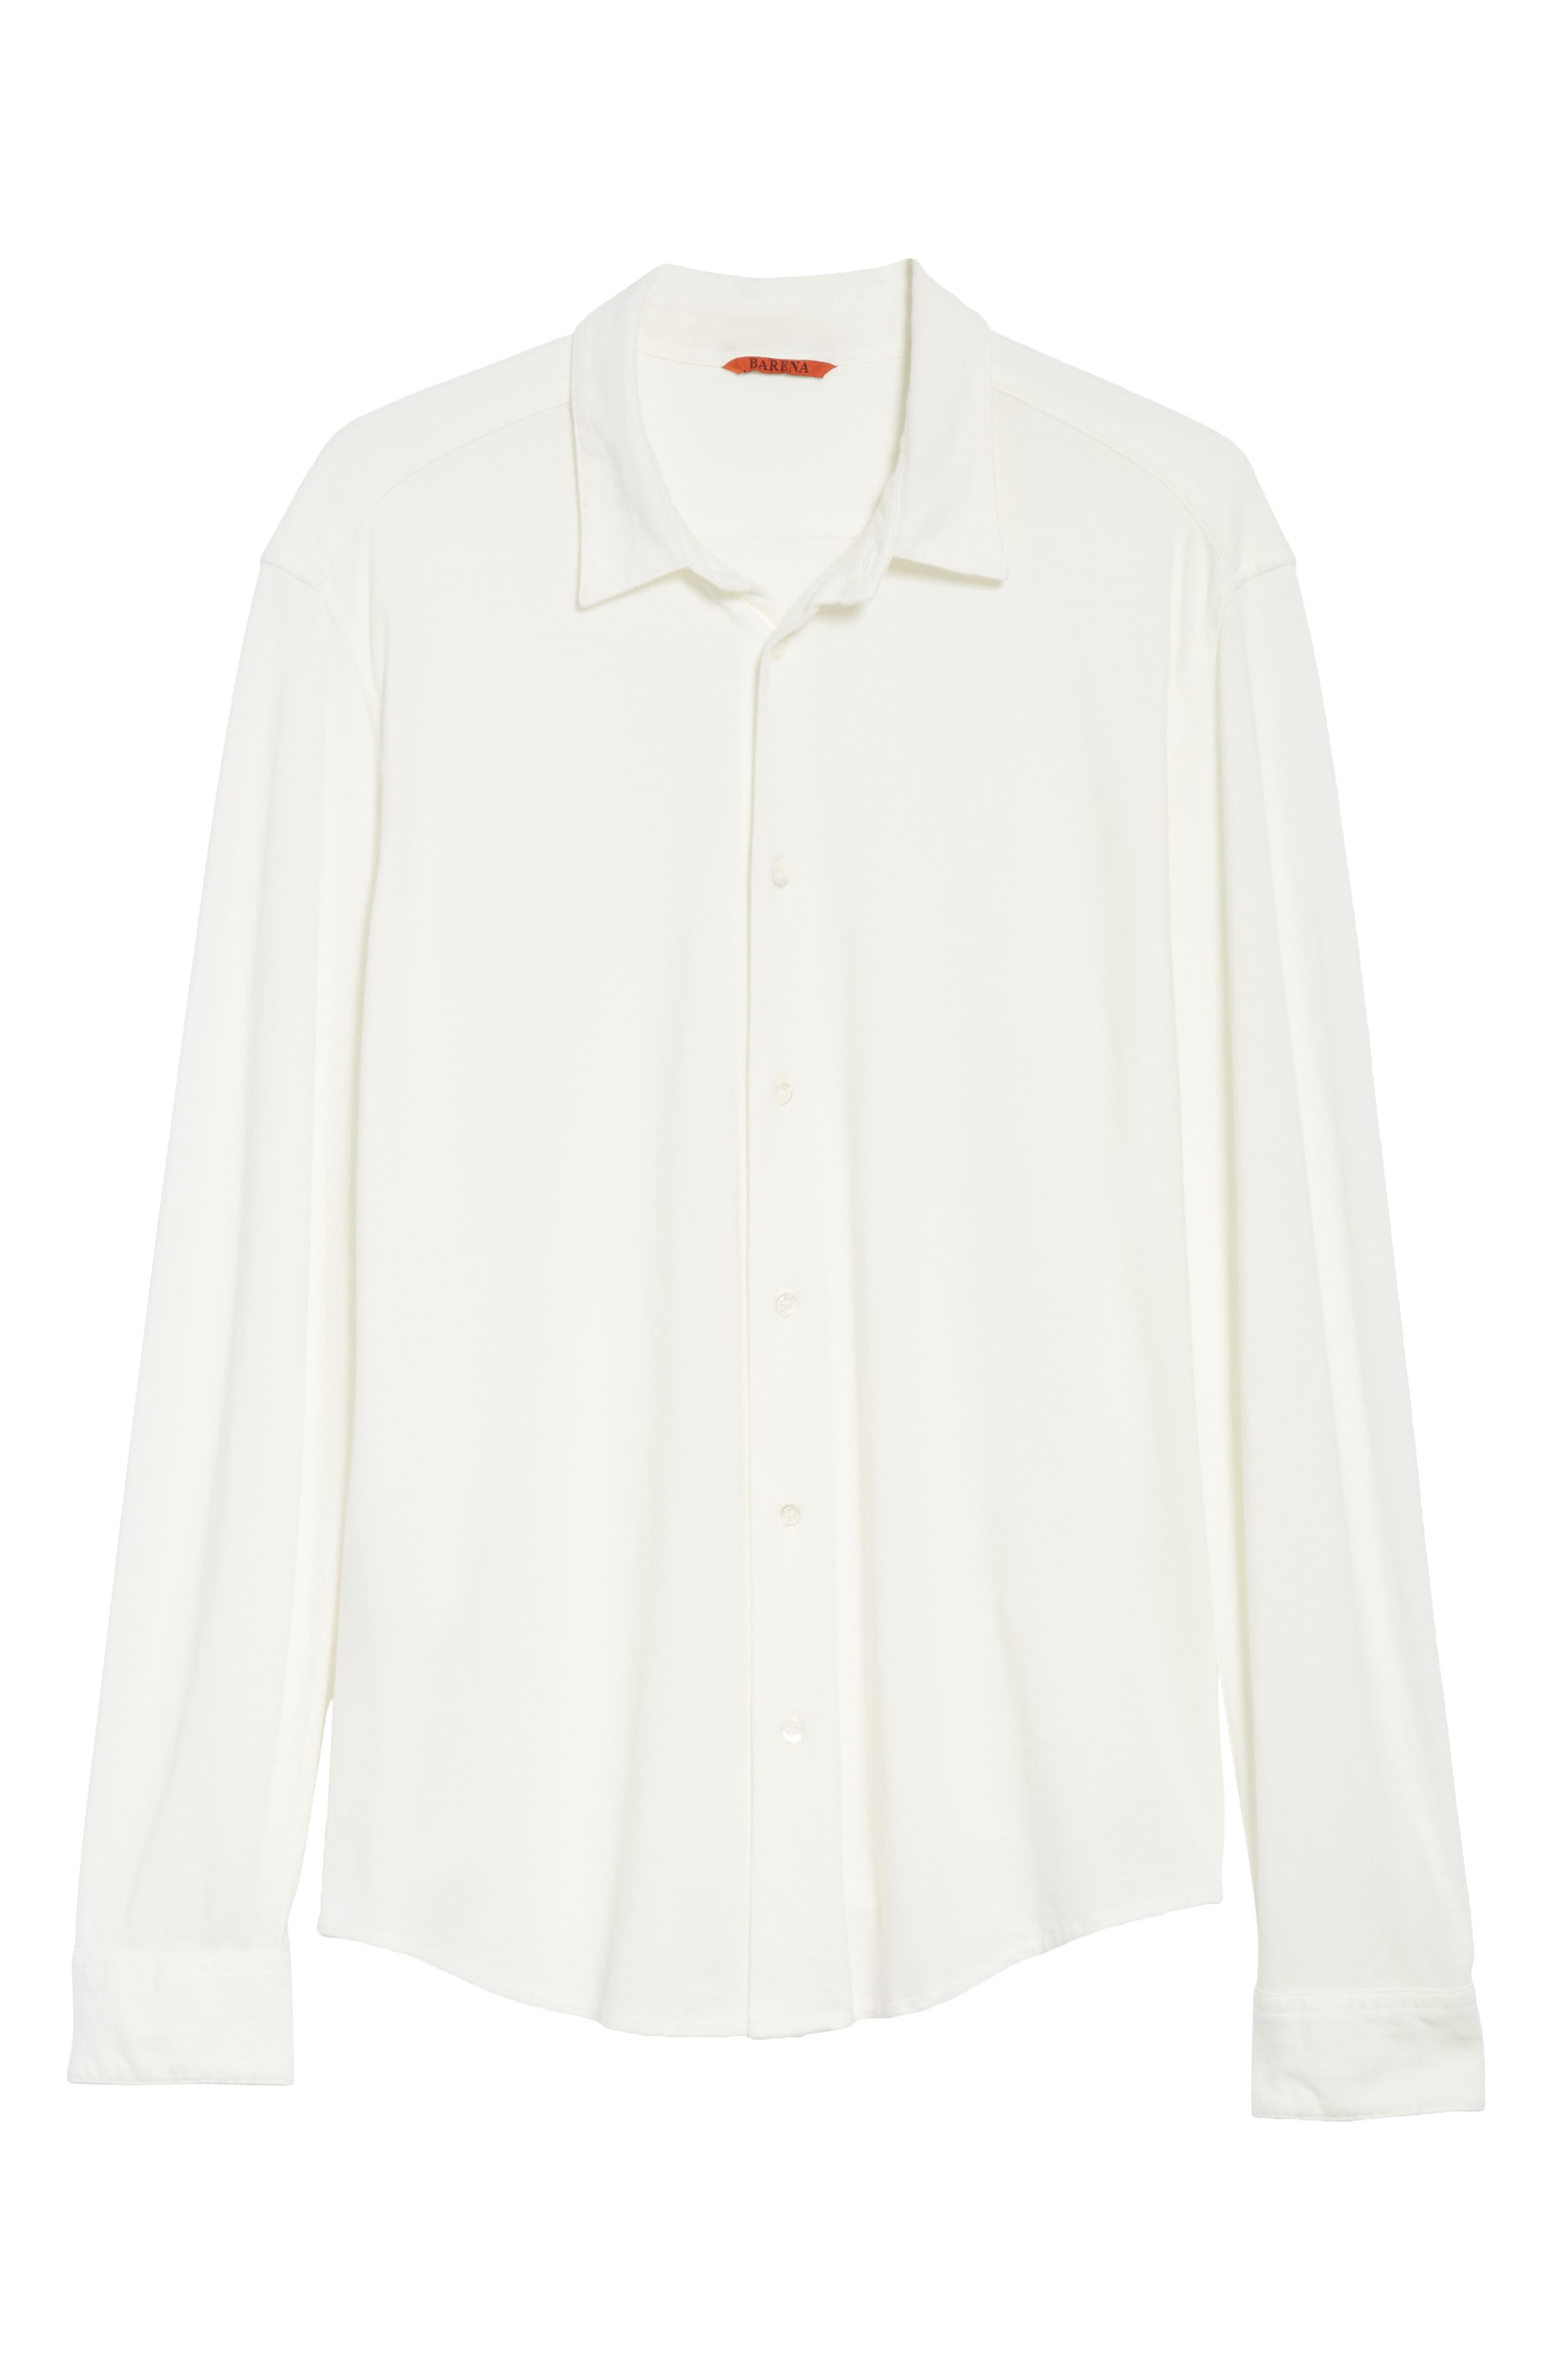 Coppi Tamiso Sport Shirt,                             Alternate thumbnail 6, color,                             WHITE